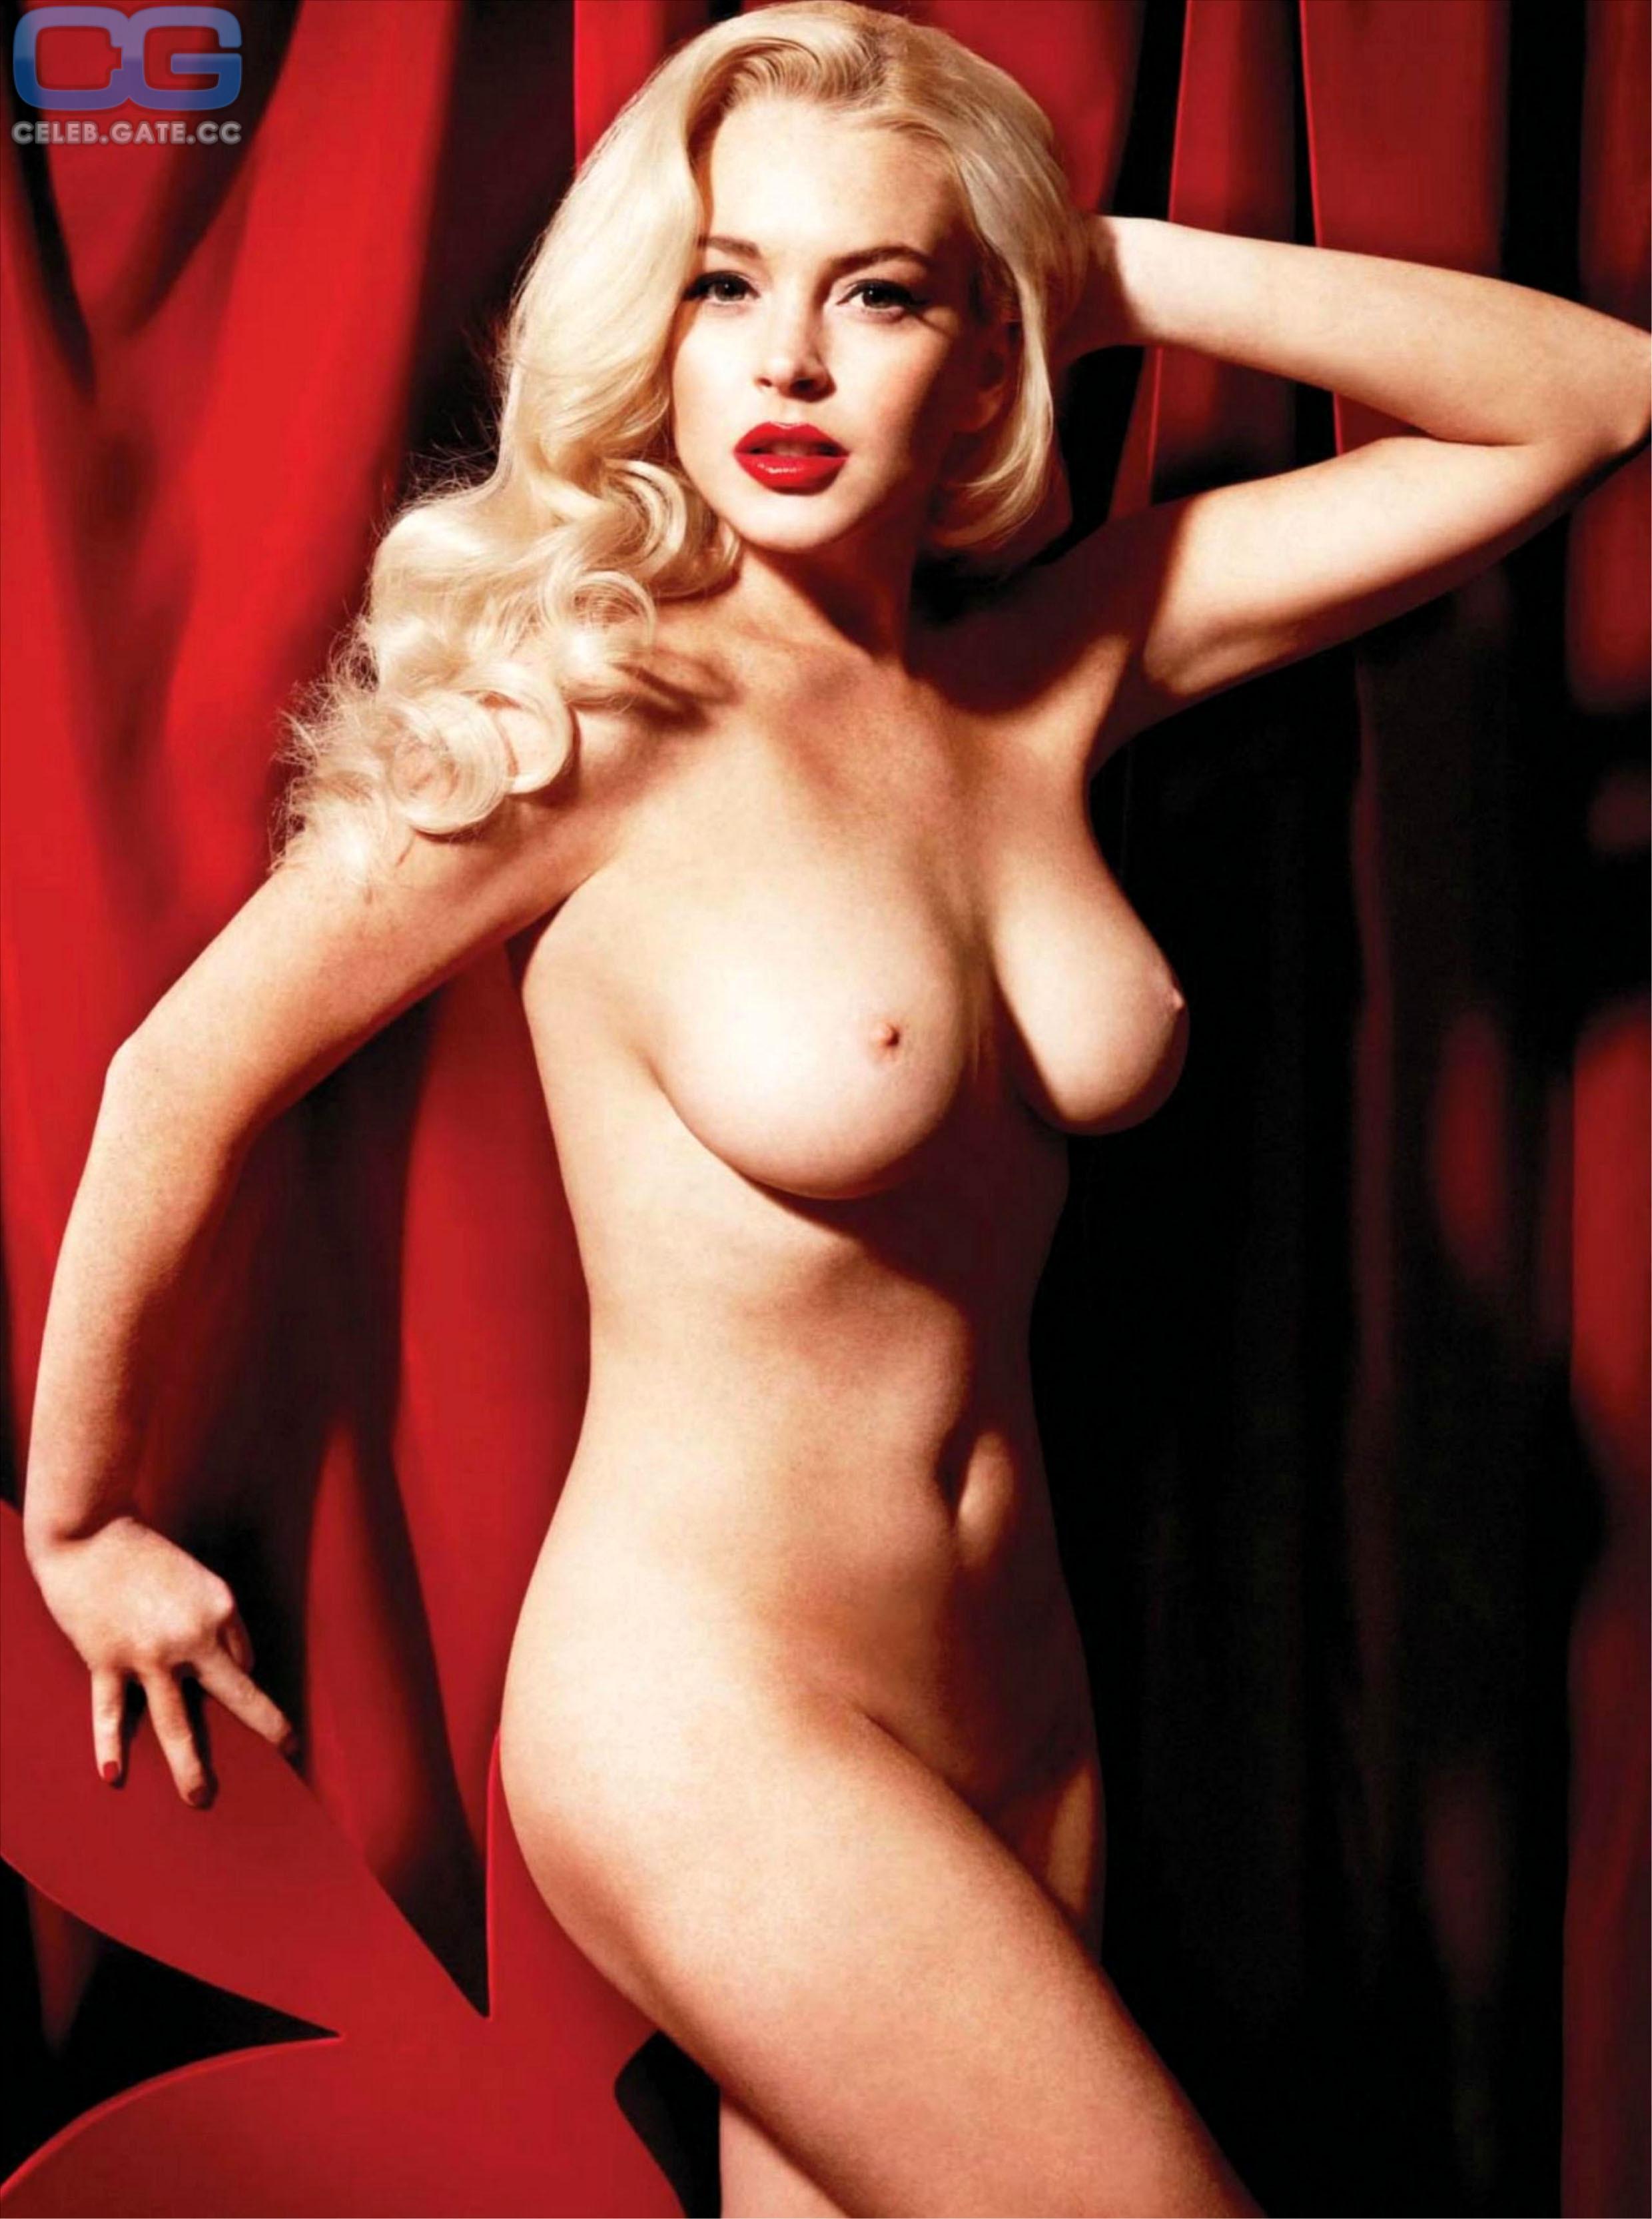 Lohan nacktbilder lindsay Banned Sex